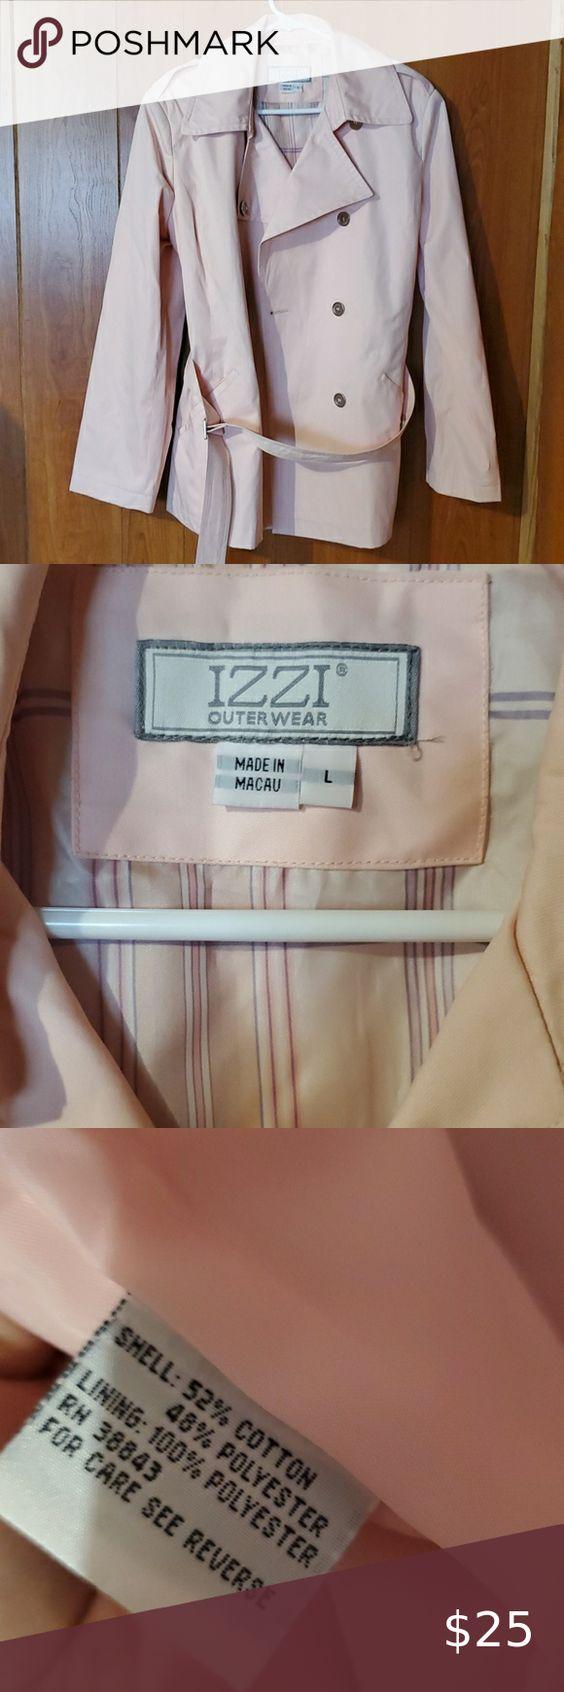 Izzy Outerwear Coat Outerwear Coats Colorful Coat Outerwear [ 1692 x 564 Pixel ]